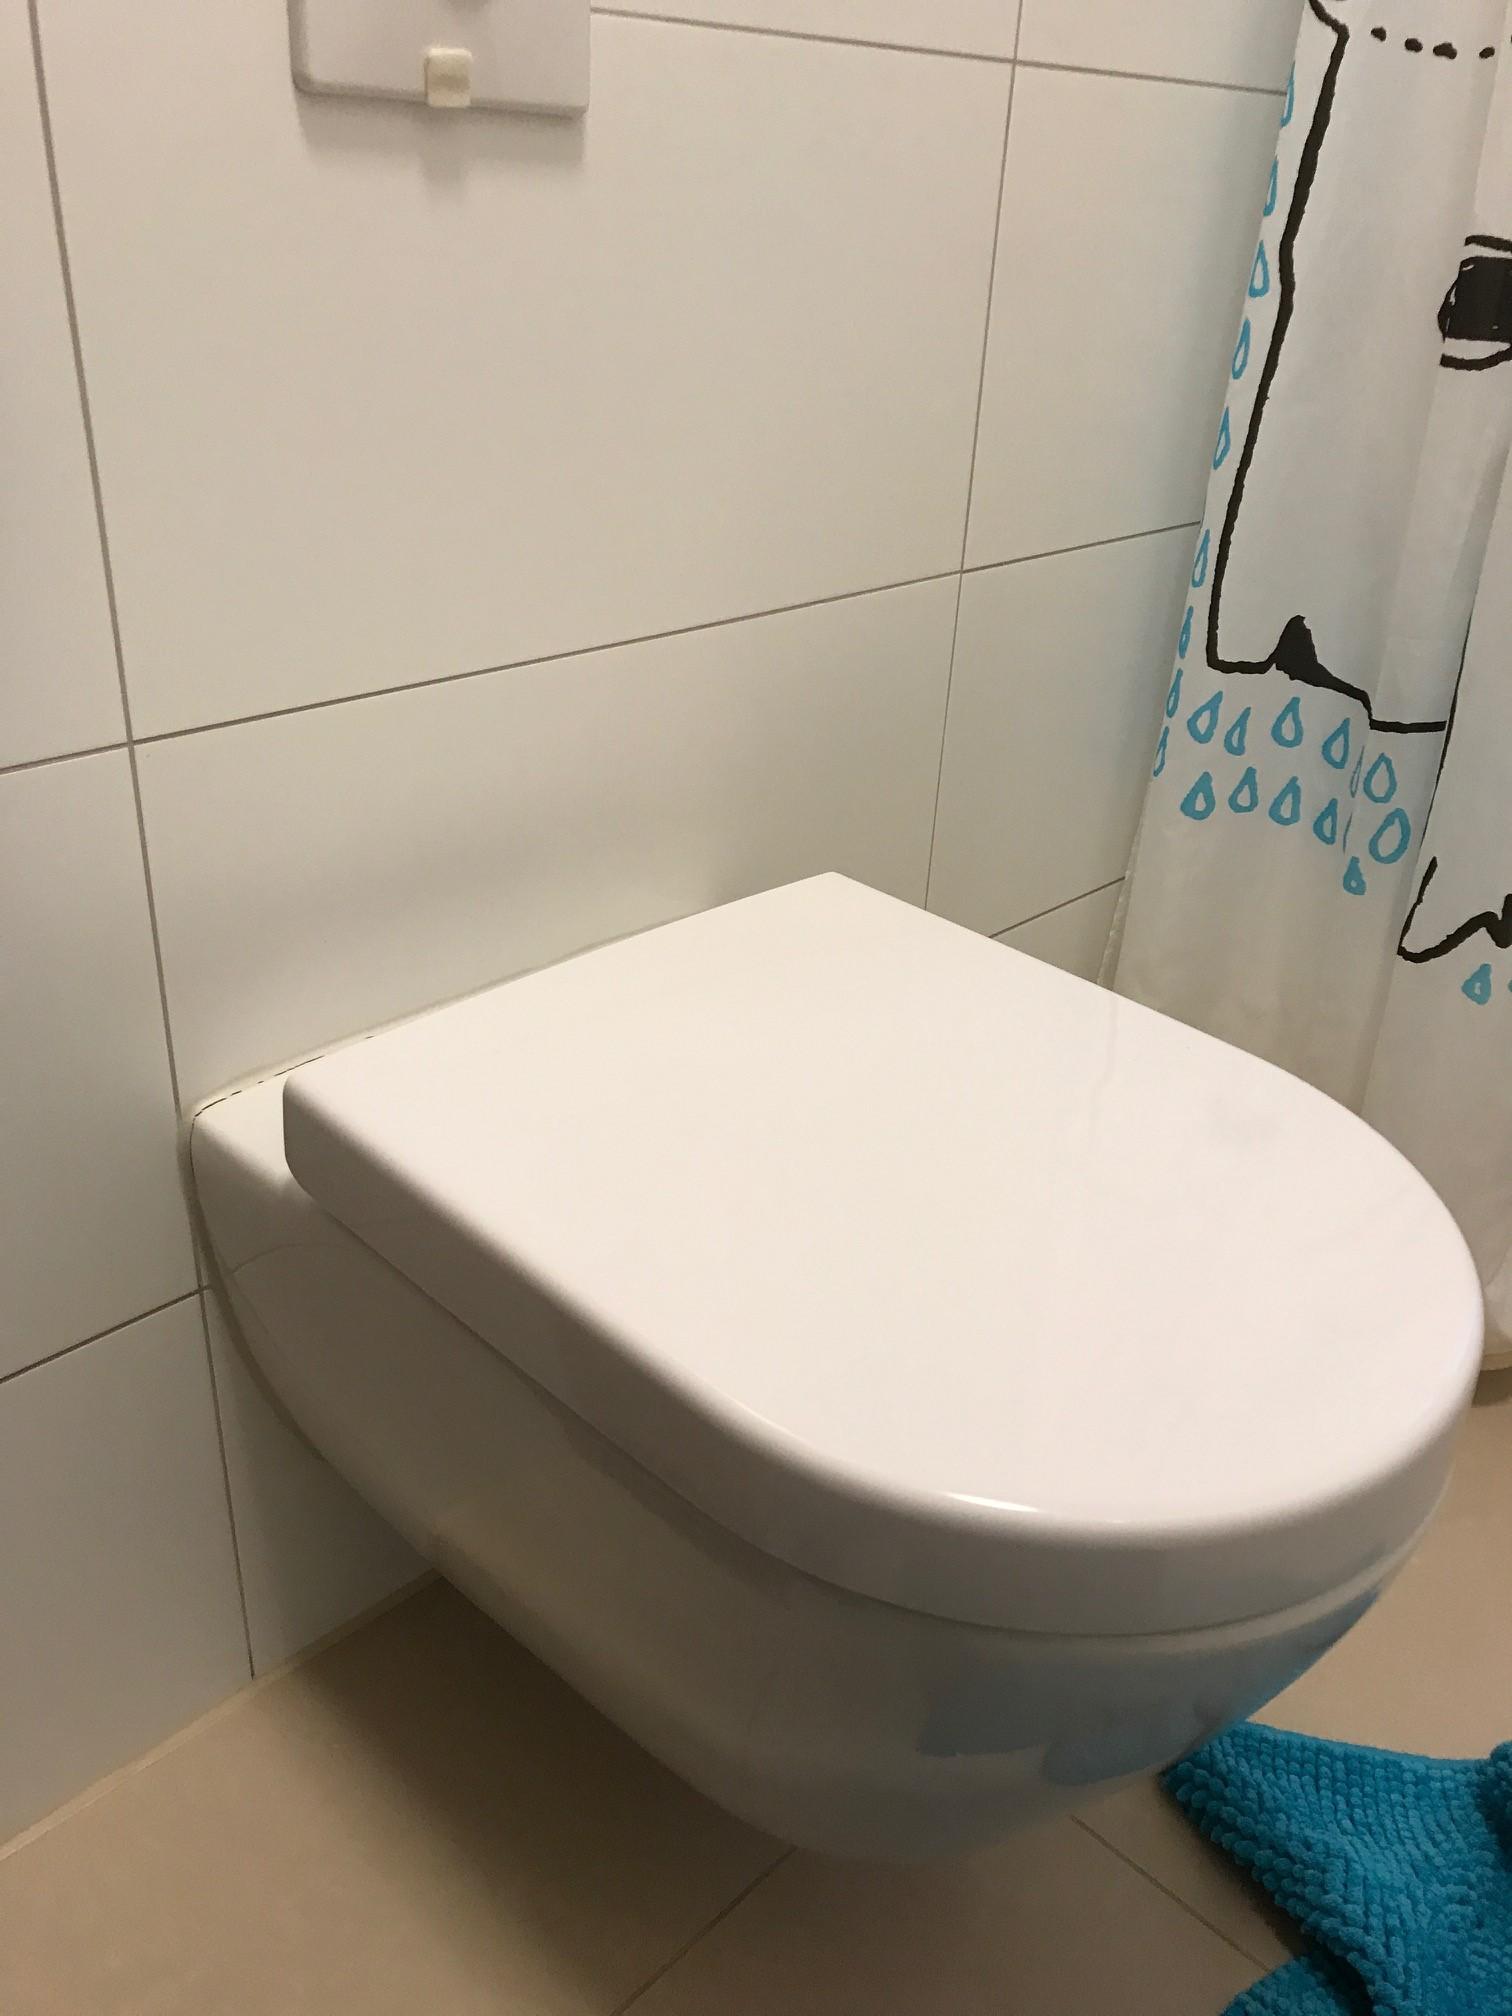 h nge wc tropft nach sp lung gesundheit und medizin toilette sanit r. Black Bedroom Furniture Sets. Home Design Ideas